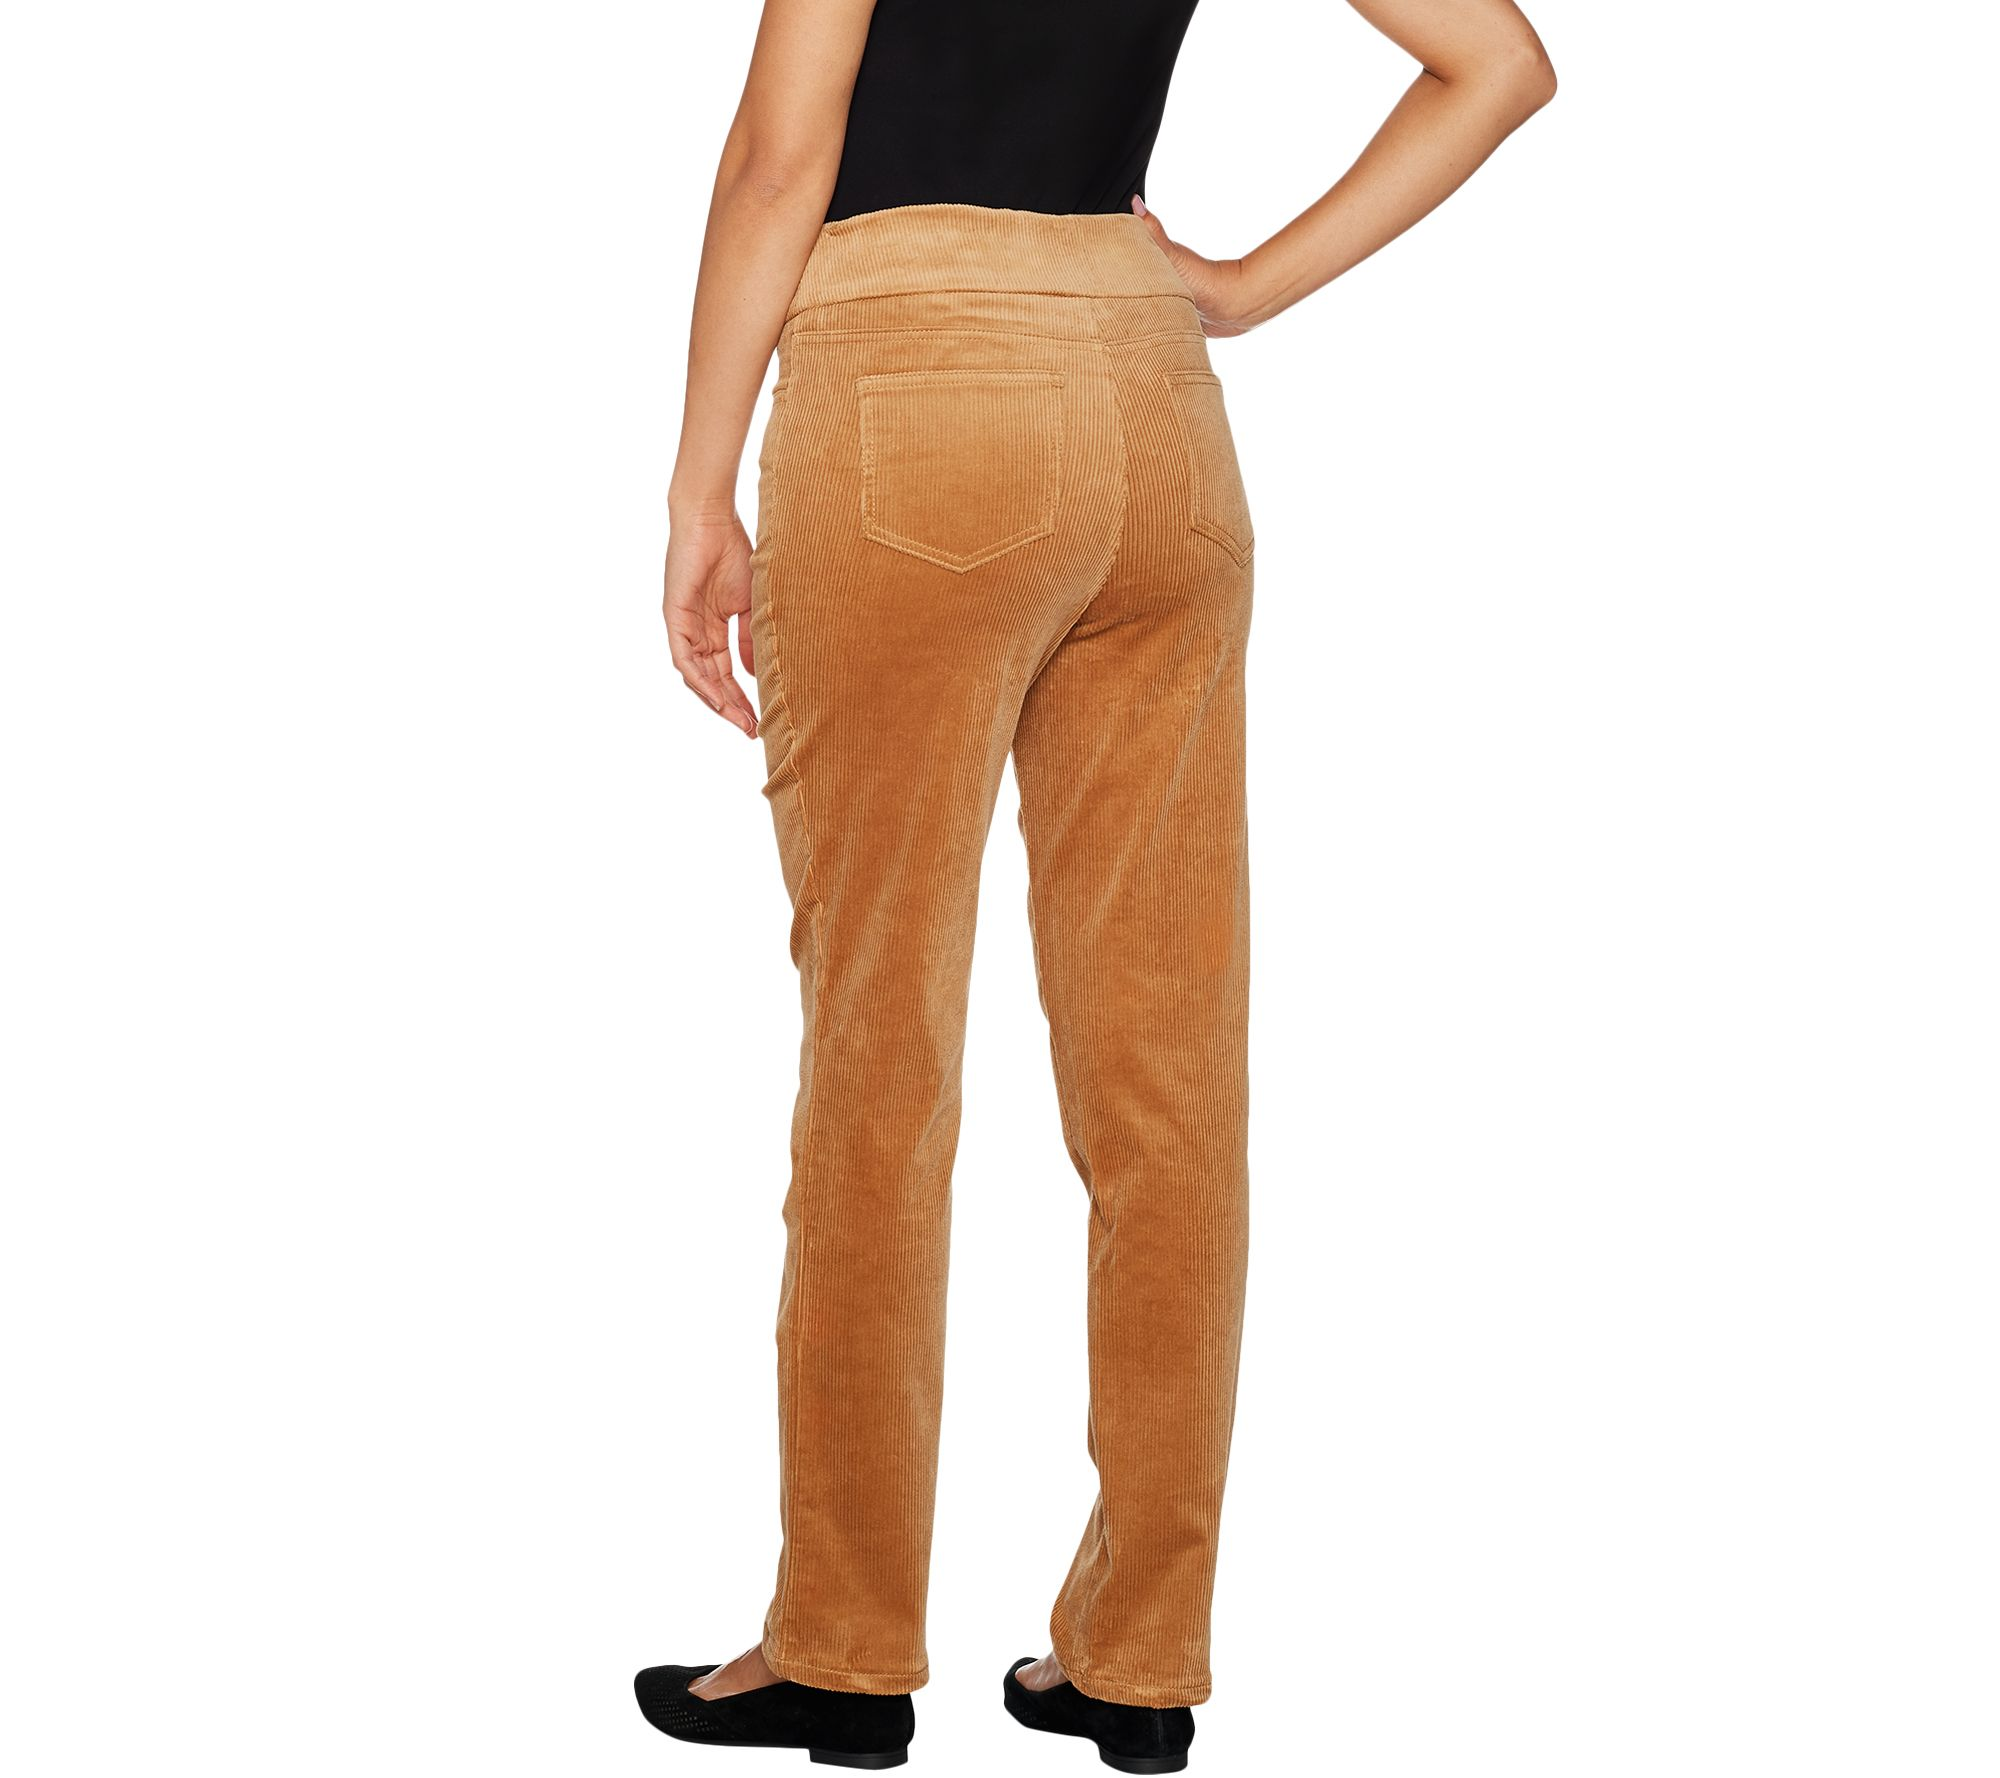 Denim /& Co Smooth Waist Stretch Corduroy Pull-on Pants Black 12 NEW A294471